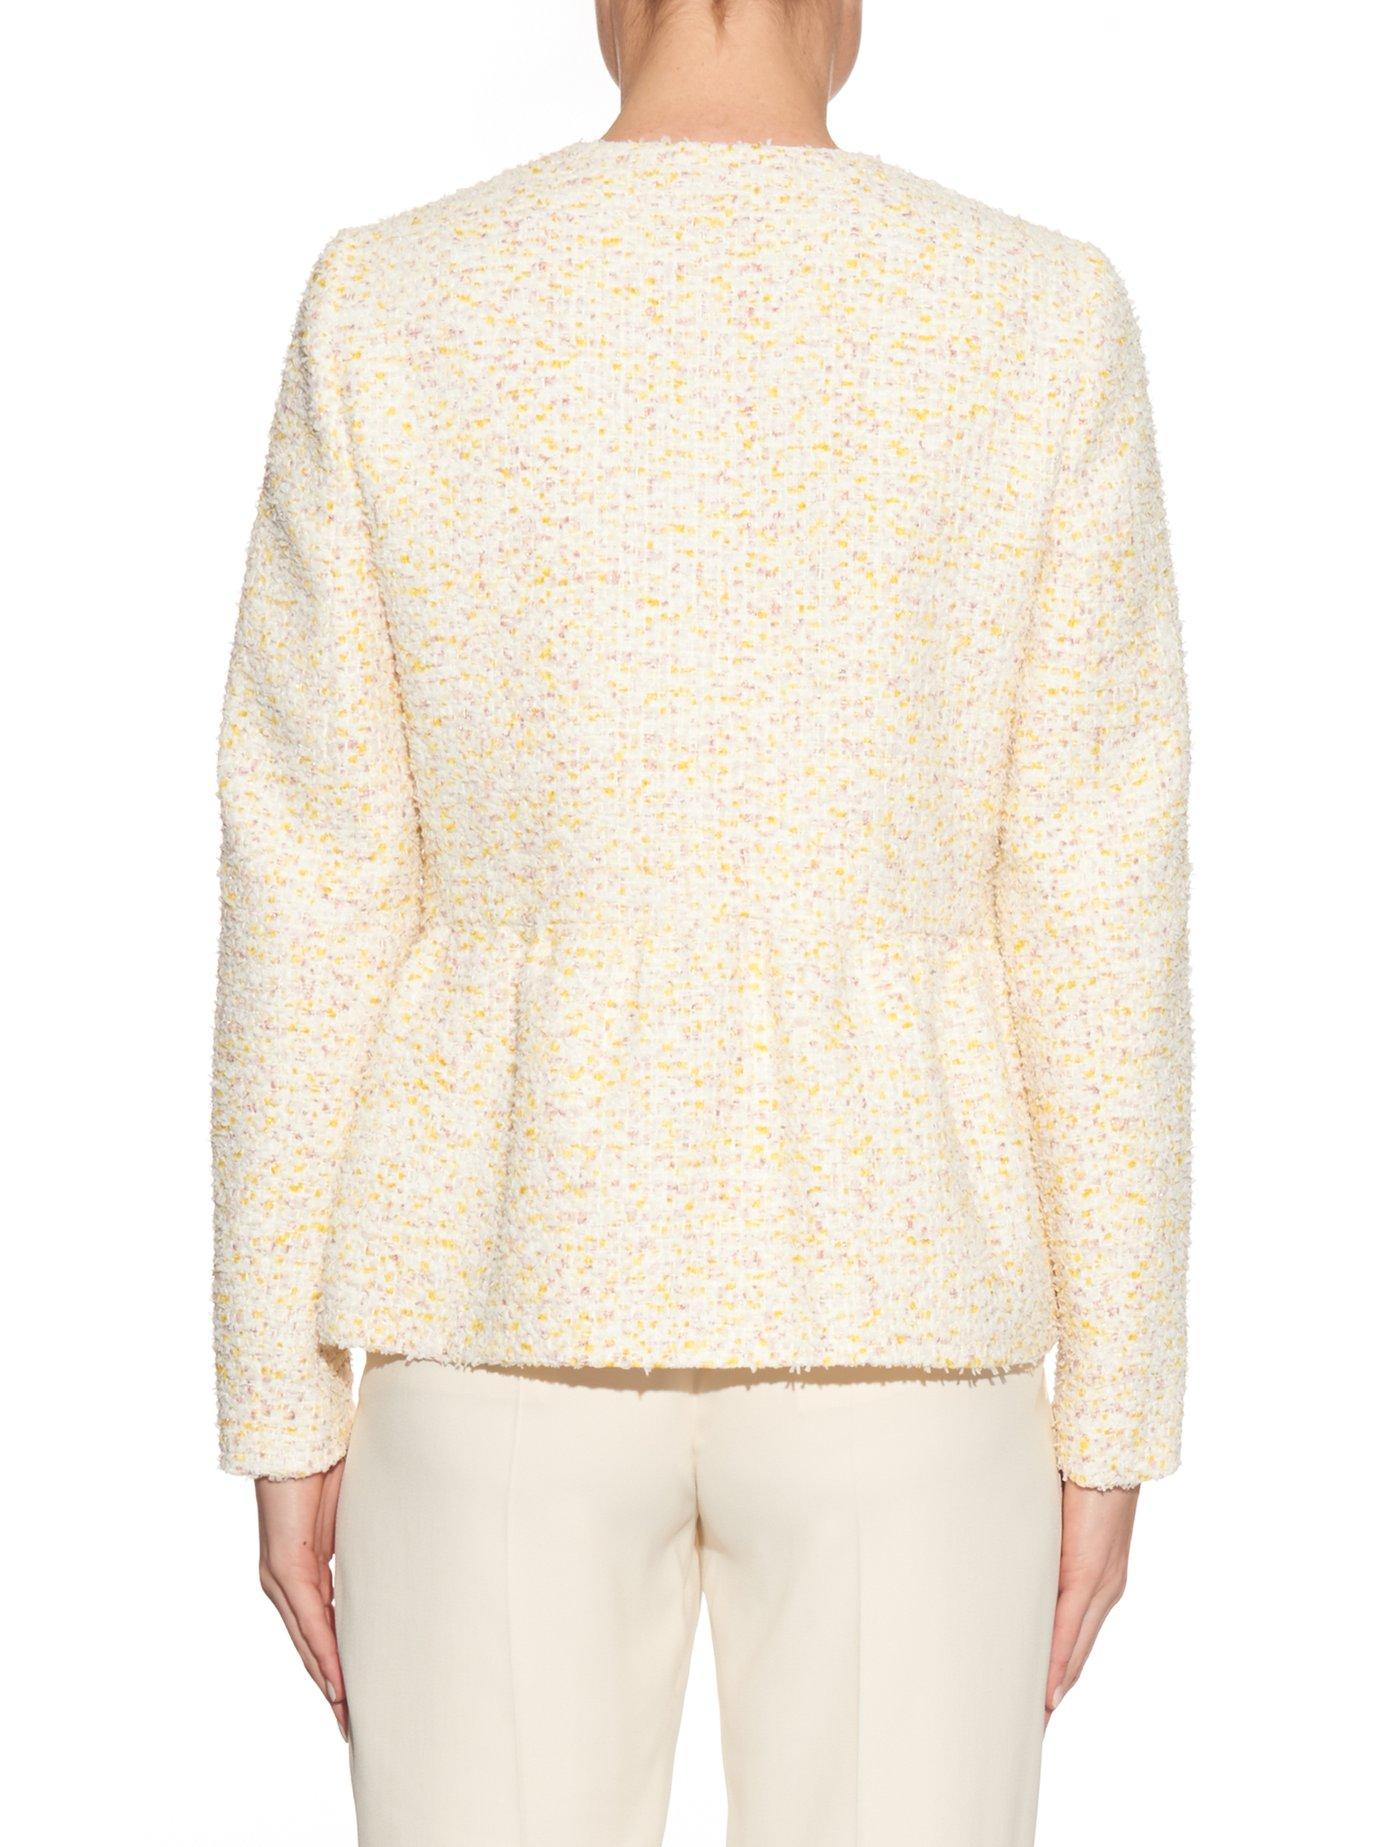 Peplum tweed jacket by Giambattista Valli